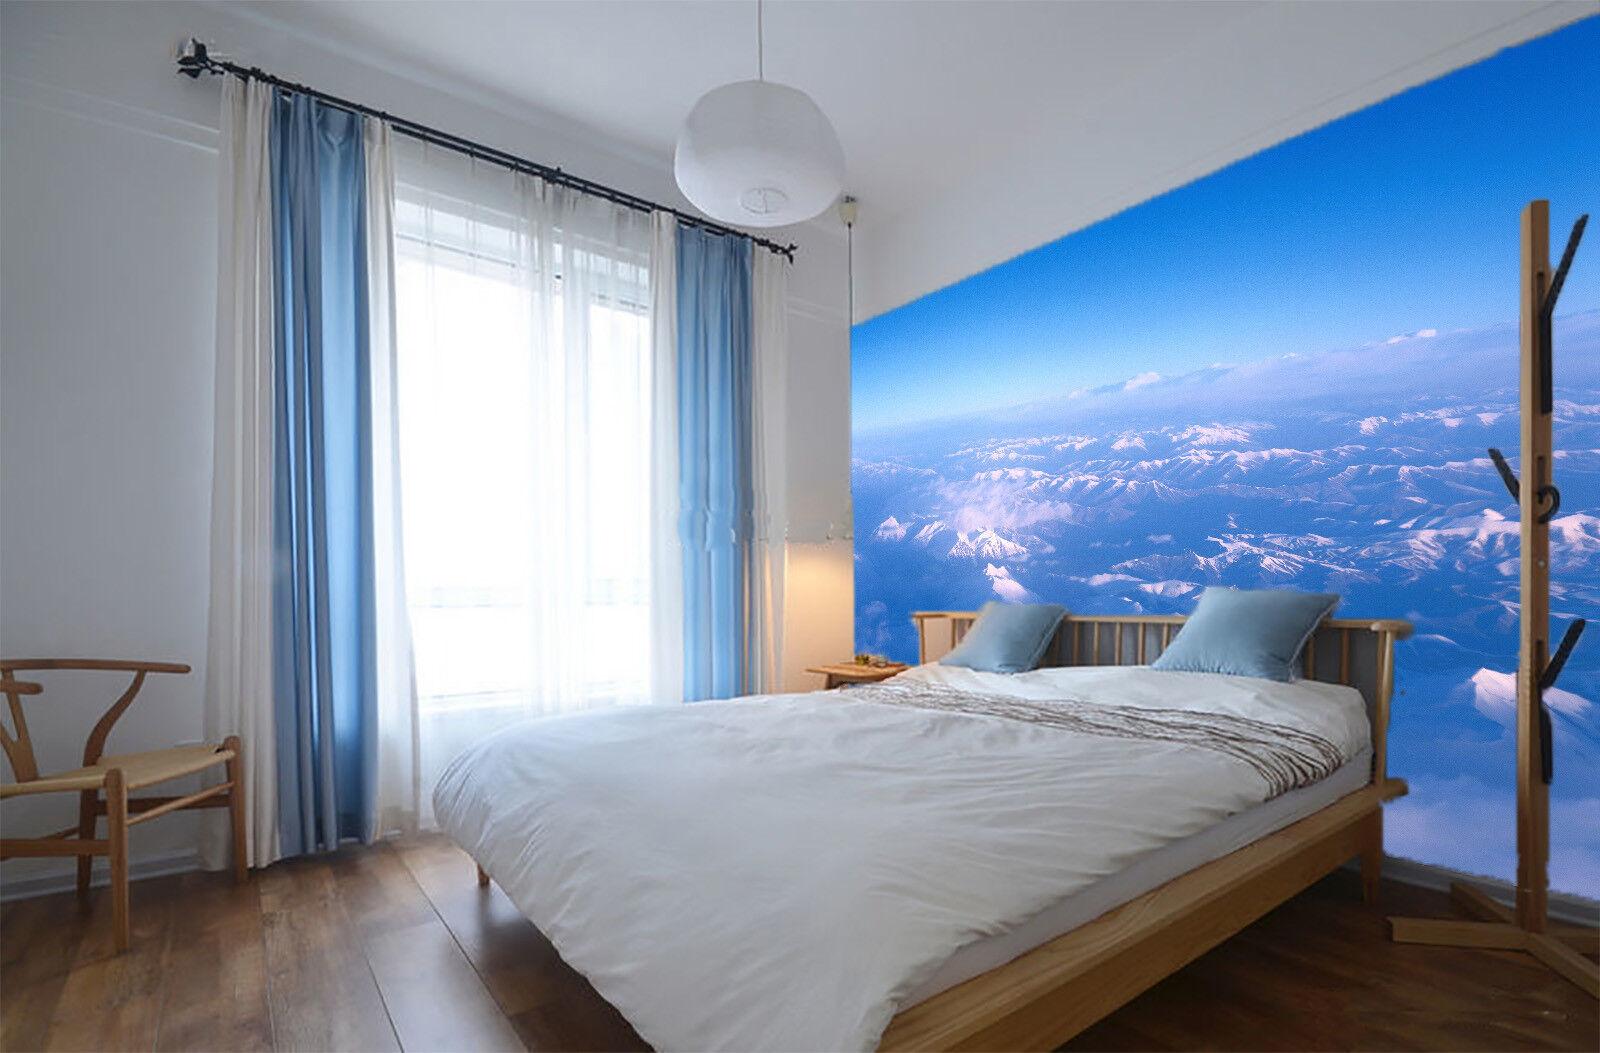 3D Höhe Himmel Fotografie 85 Tapete Wandgemälde Tapete Tapeten Bild Familie DE | Shopping Online  | Erschwinglich  | Ausgewählte Materialien